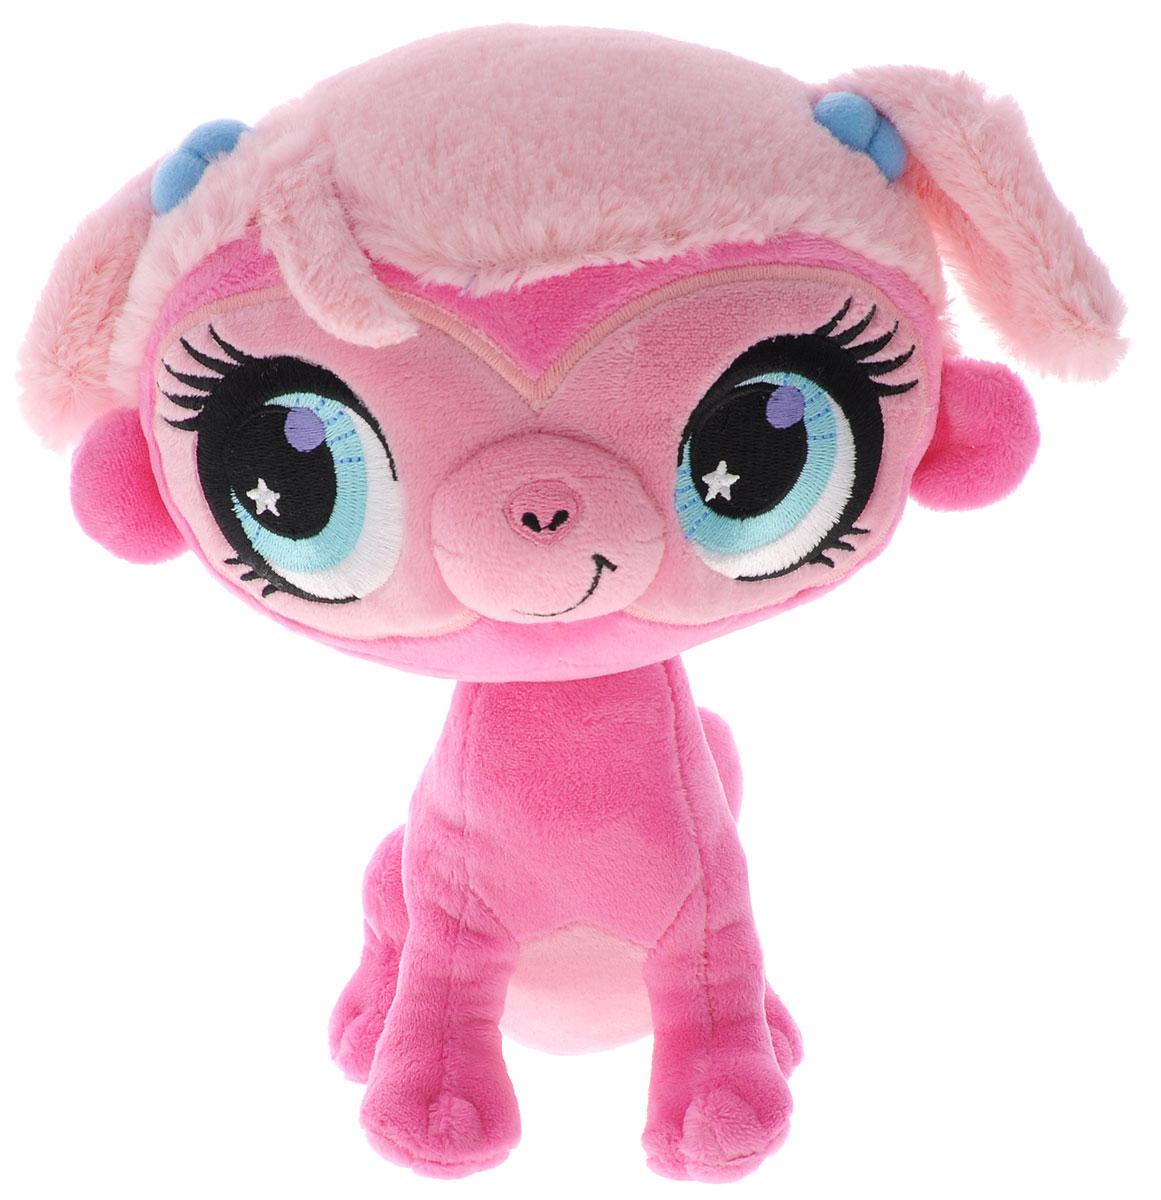 Littlest Pet Shop Мягкая игрушка Зверушка Минка цвет фуксия 20 см лителес пет шоп кошки стоячки